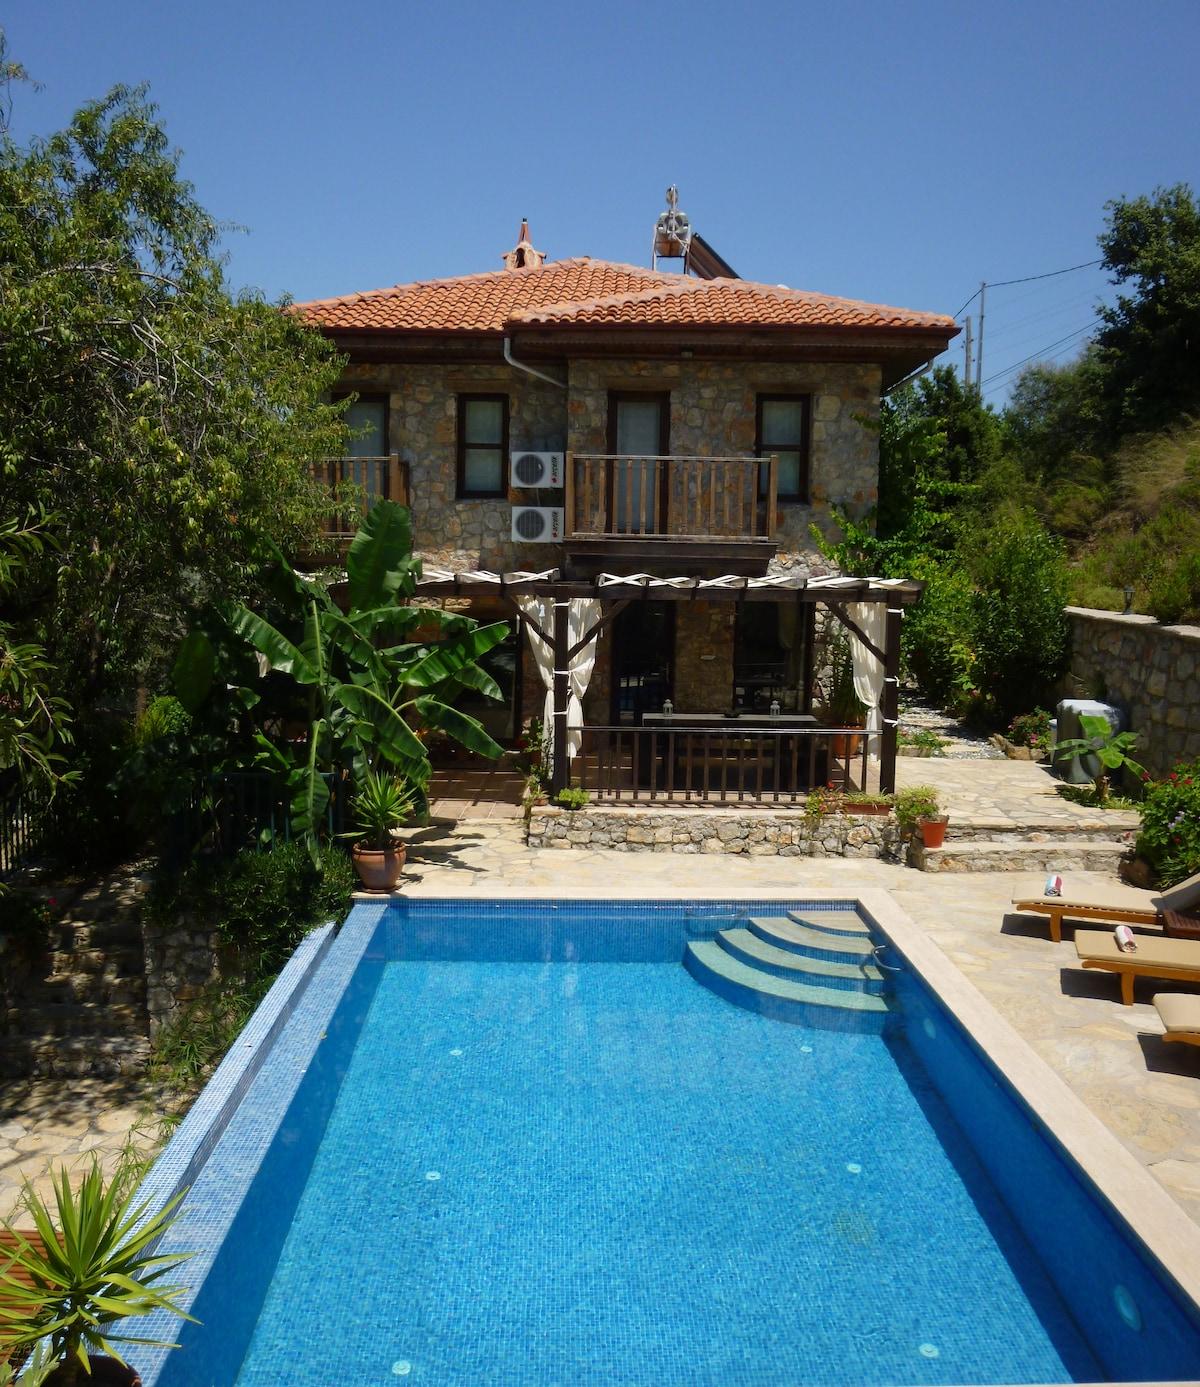 Villa Gelincik - villa, pool and sunbathing area